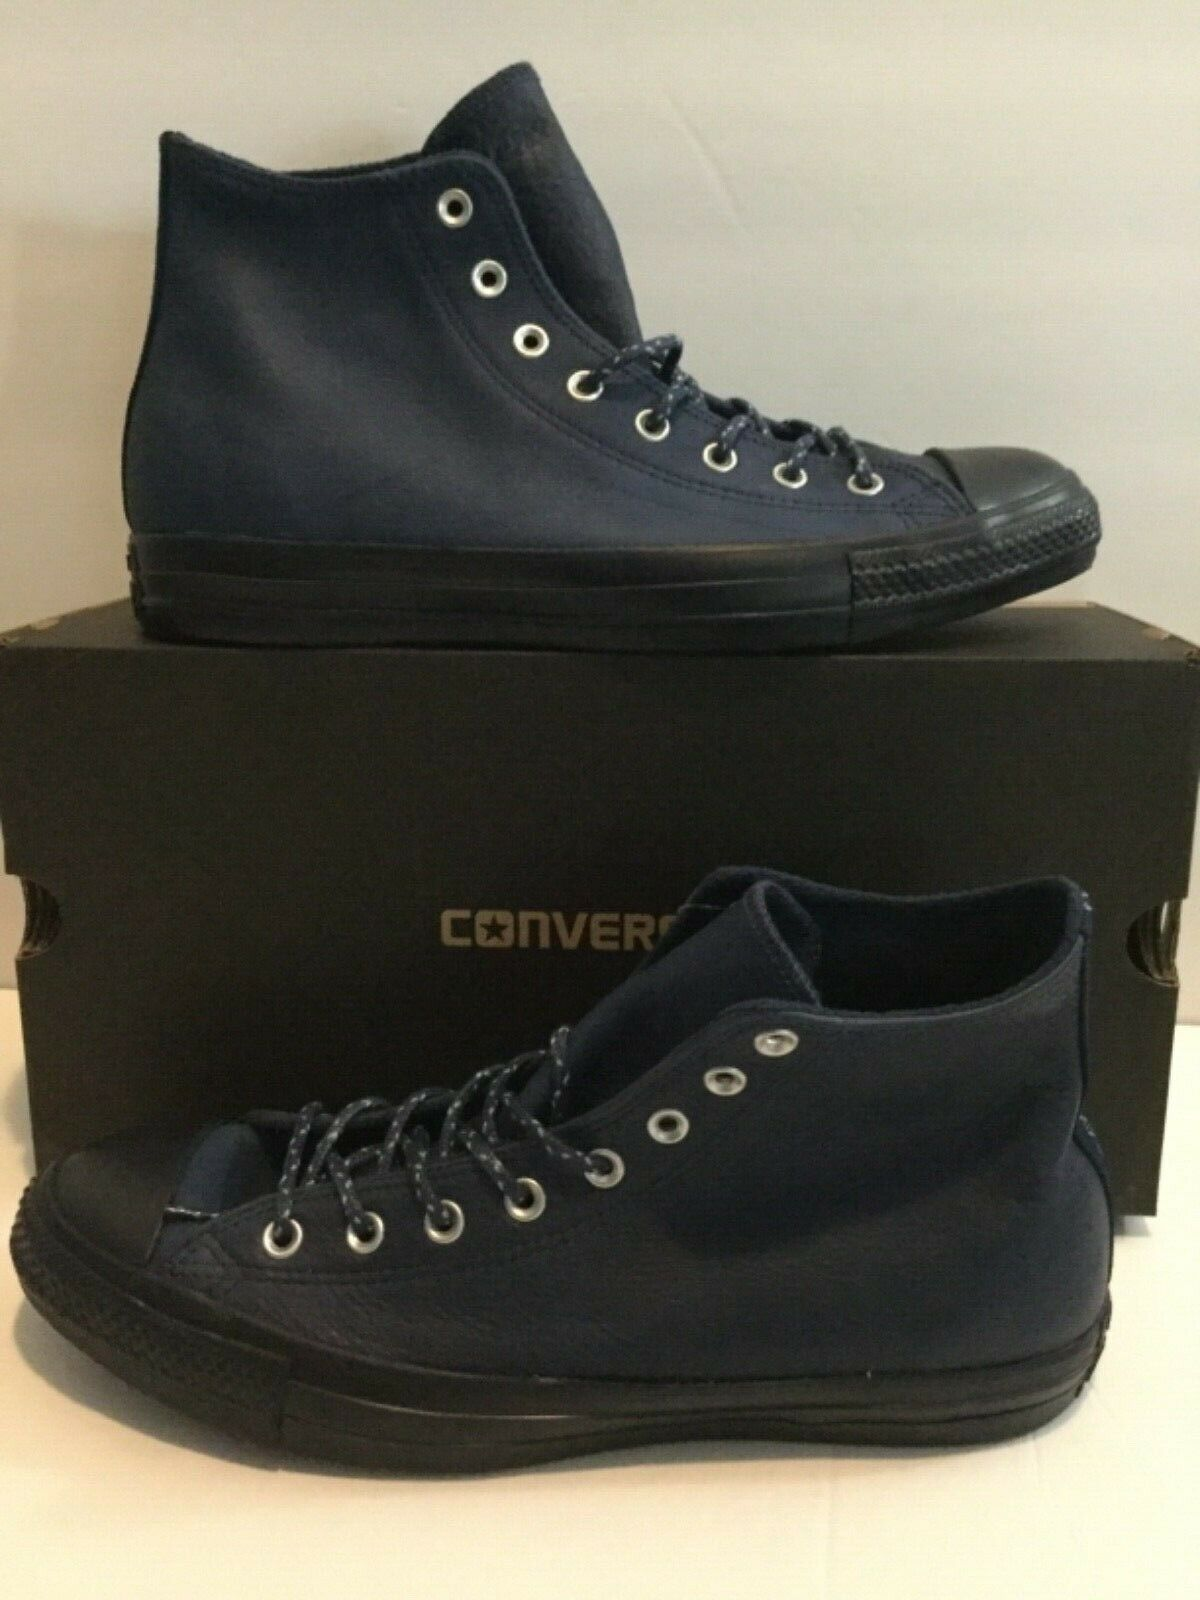 Converse CTAS Hi Shoes Navy Leather Mens Size 11.5 New